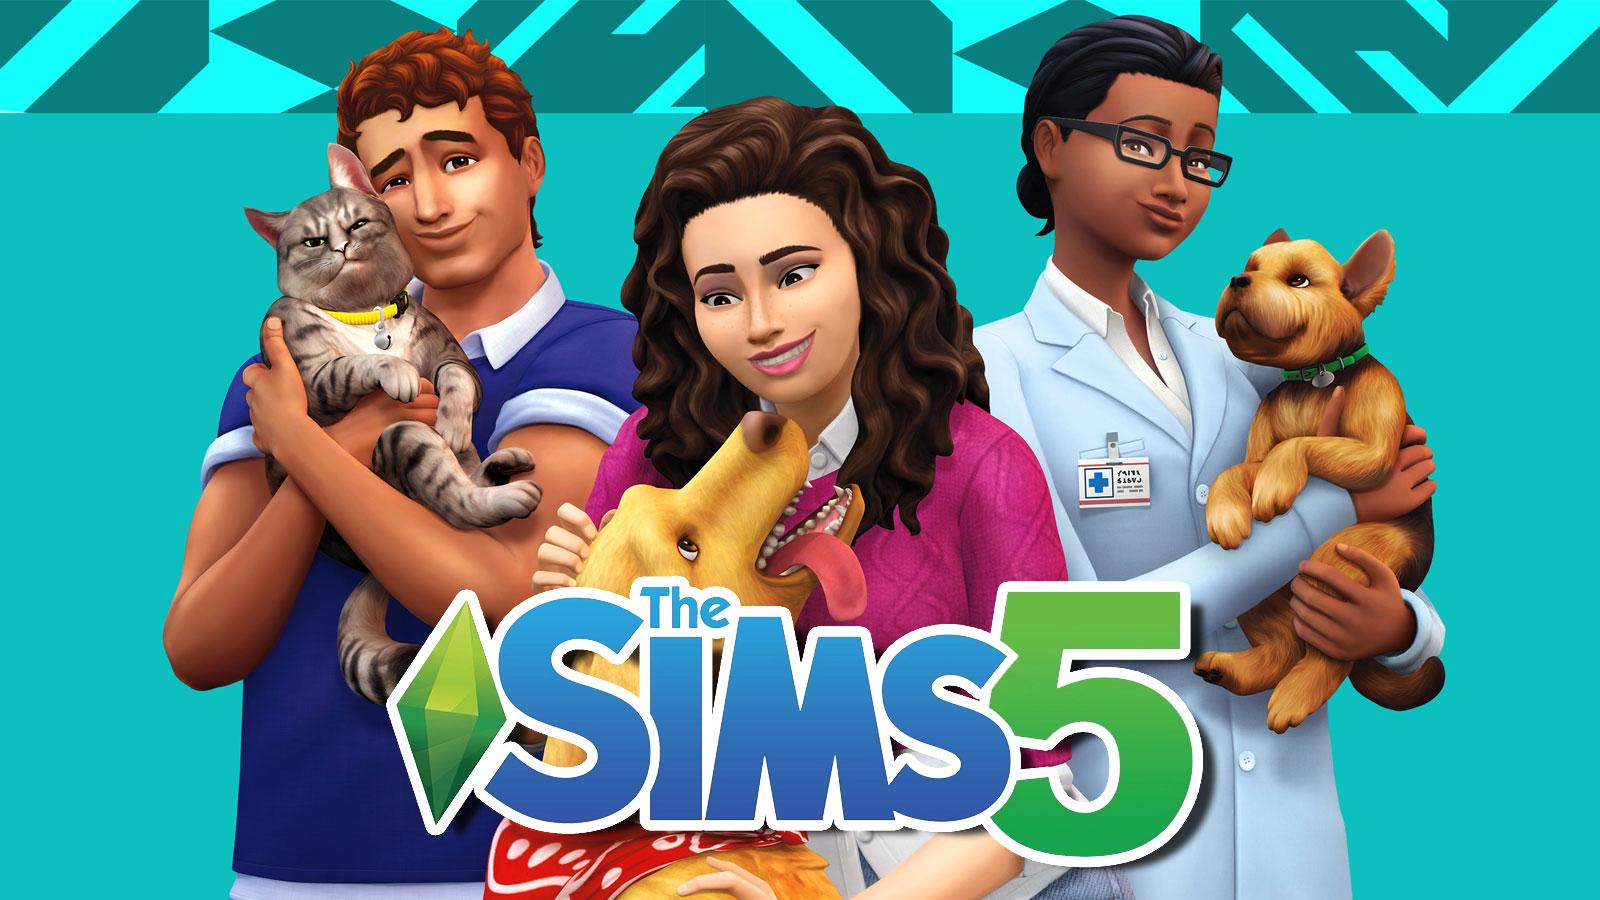 the sims 5 promo art